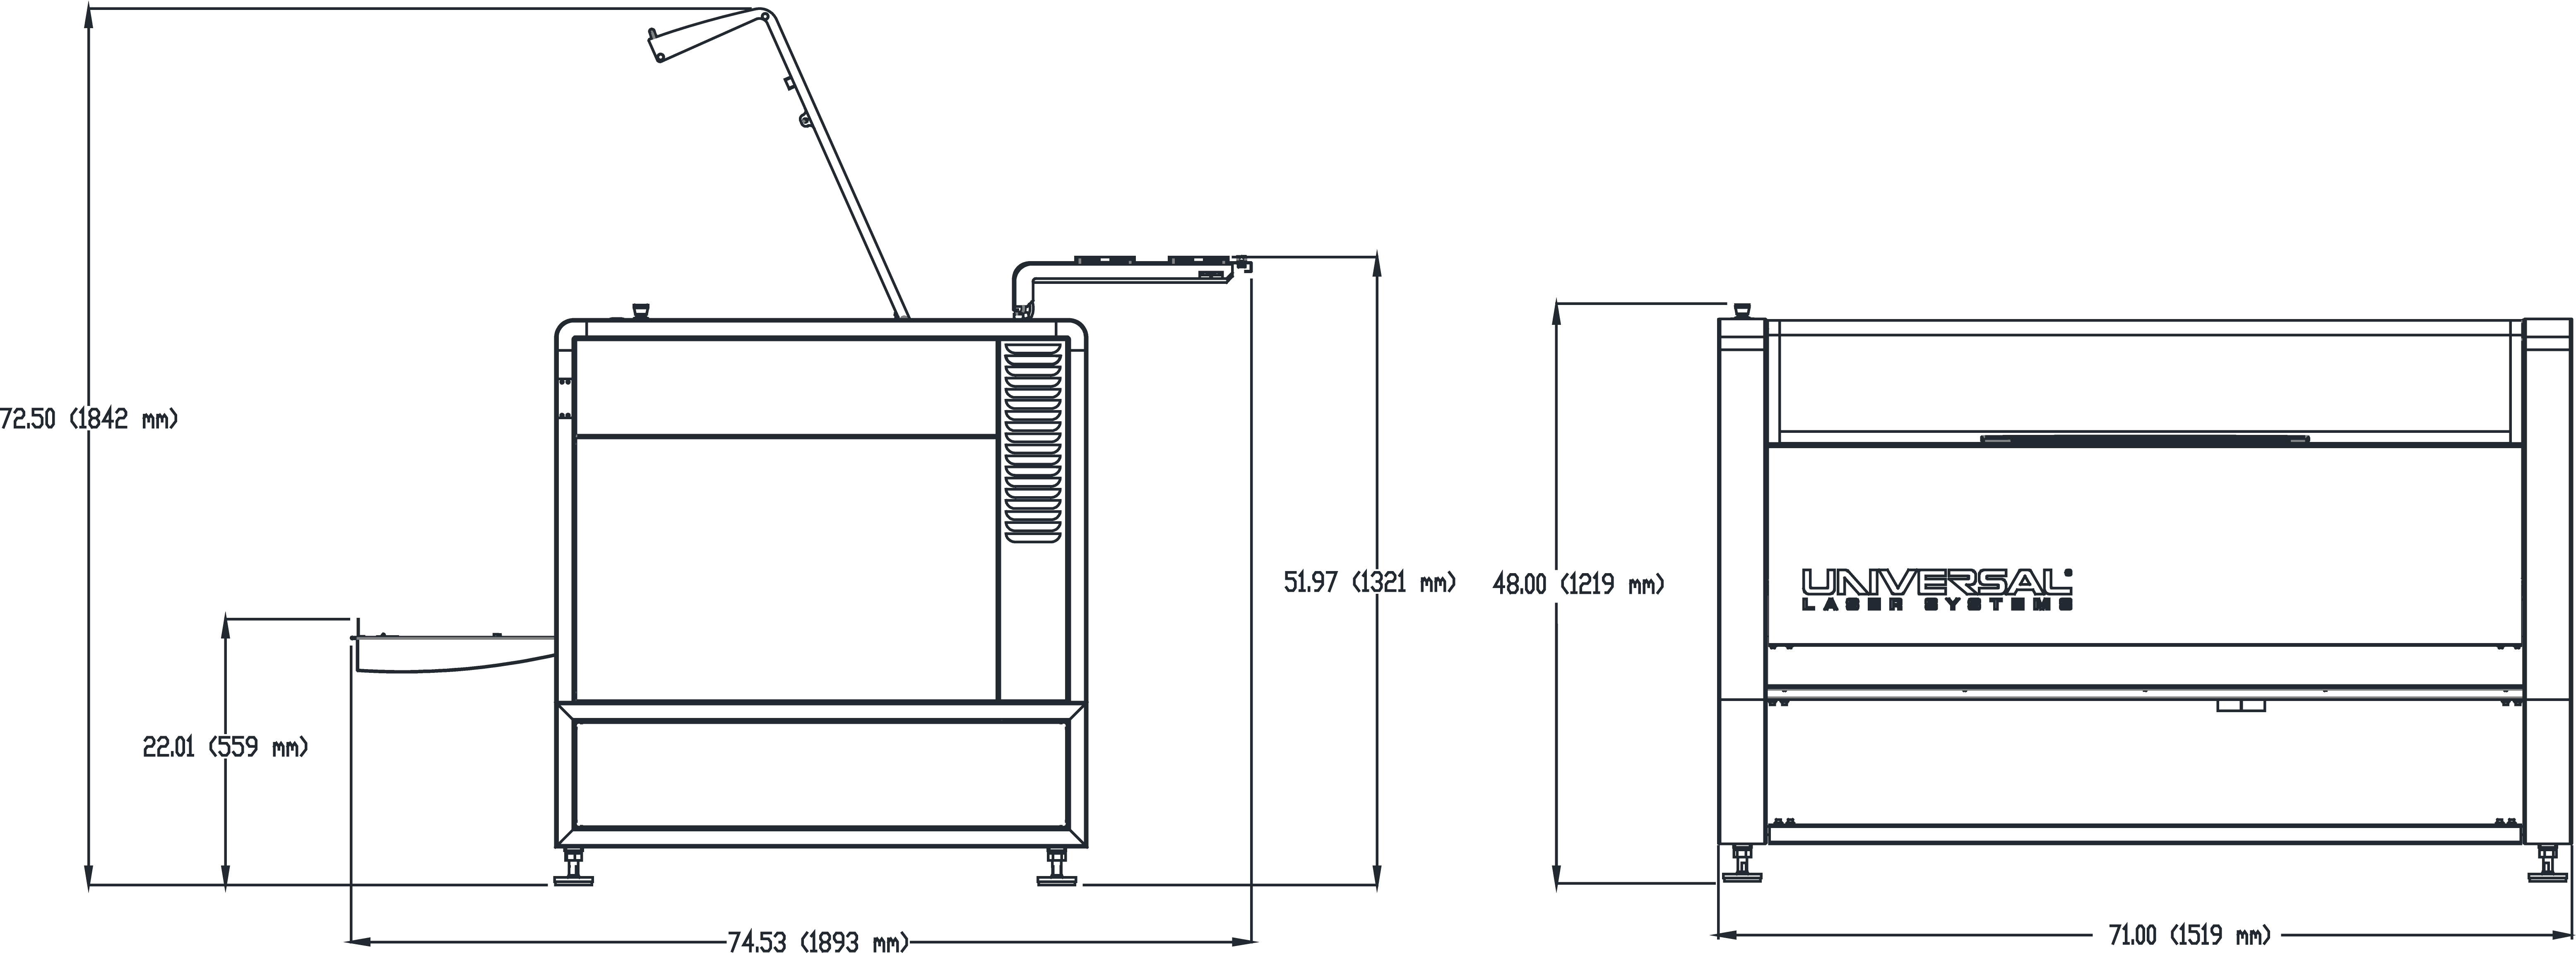 ULTRA R9000 Dimensional Drawing